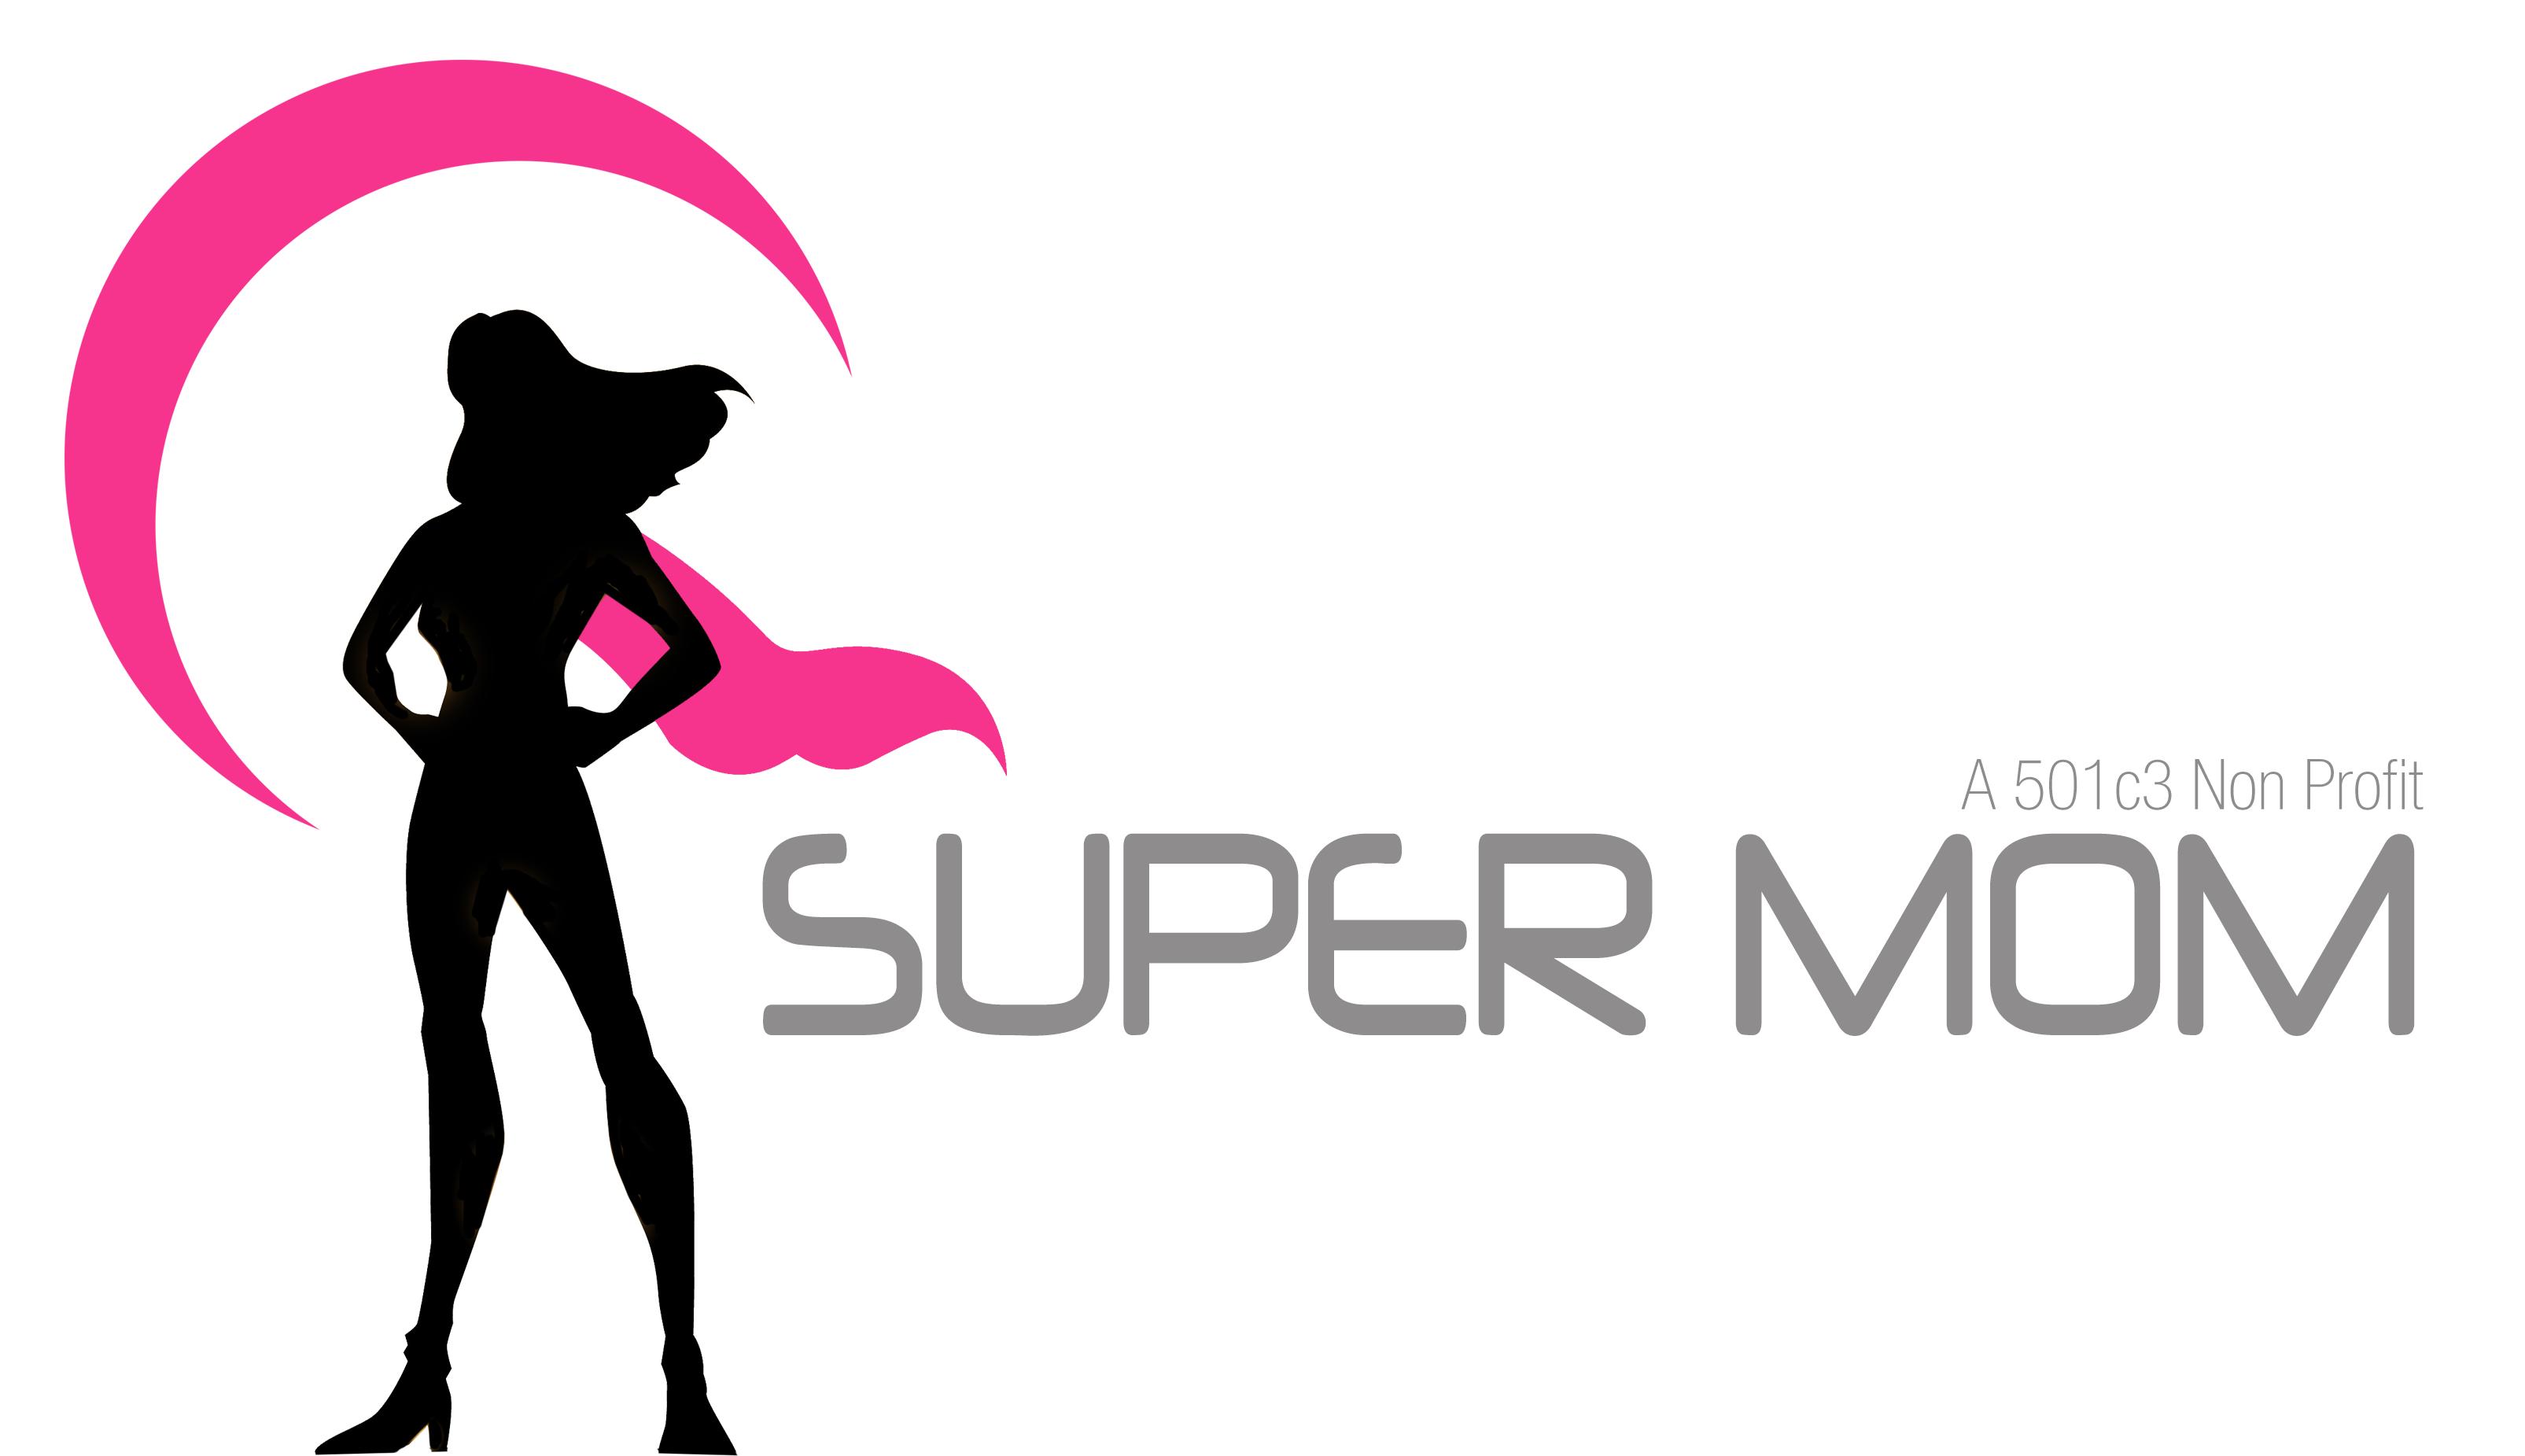 Super Mom Clip Art - Google Search | Mom-super mom clip art - Google Search | Momu0026#39;s Club | Pinterest | Super mom, Art and Mom clips-14